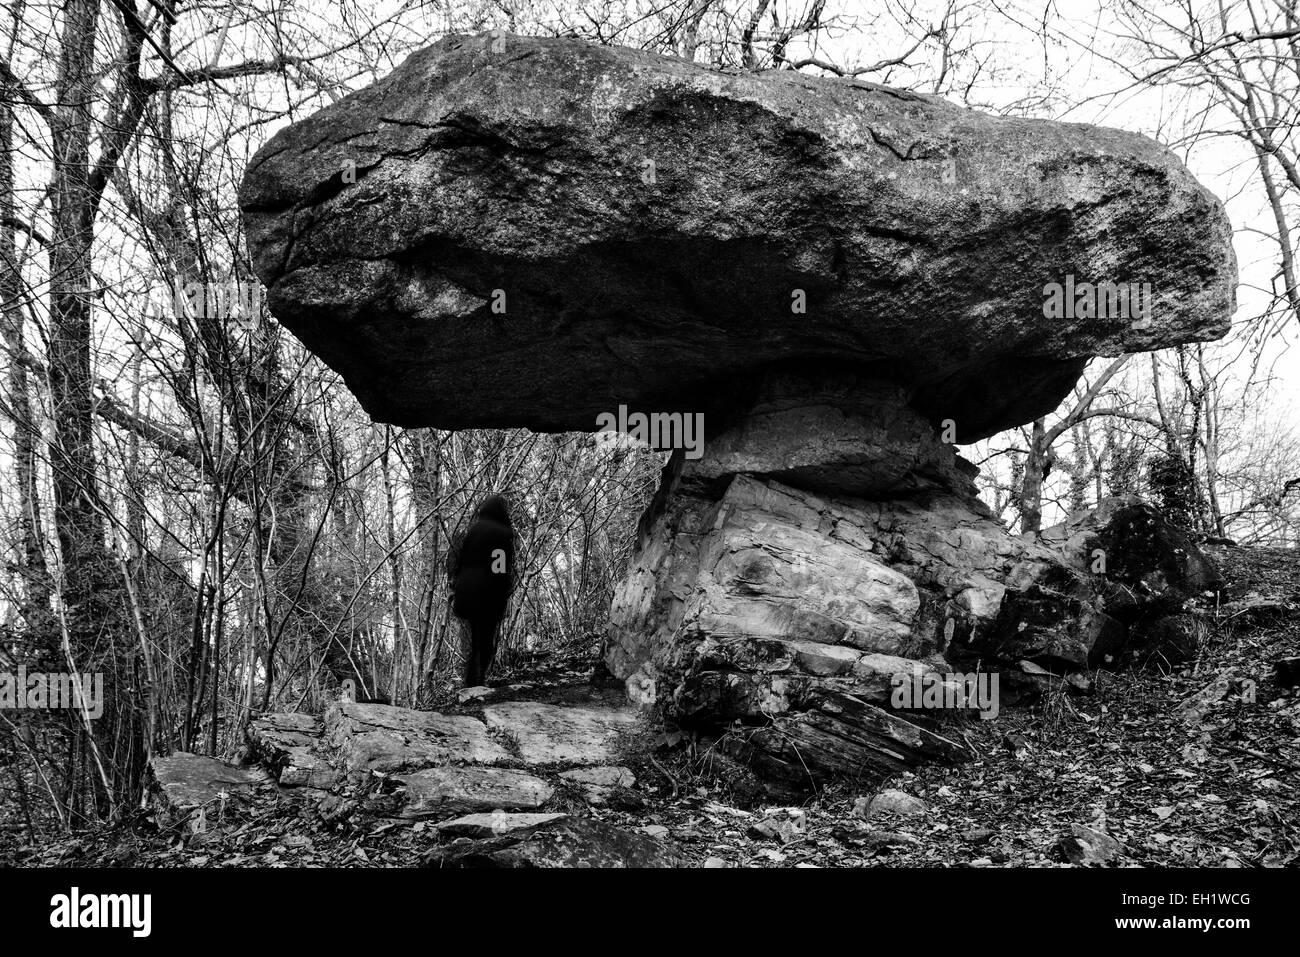 Big erratic rock - Stock Image